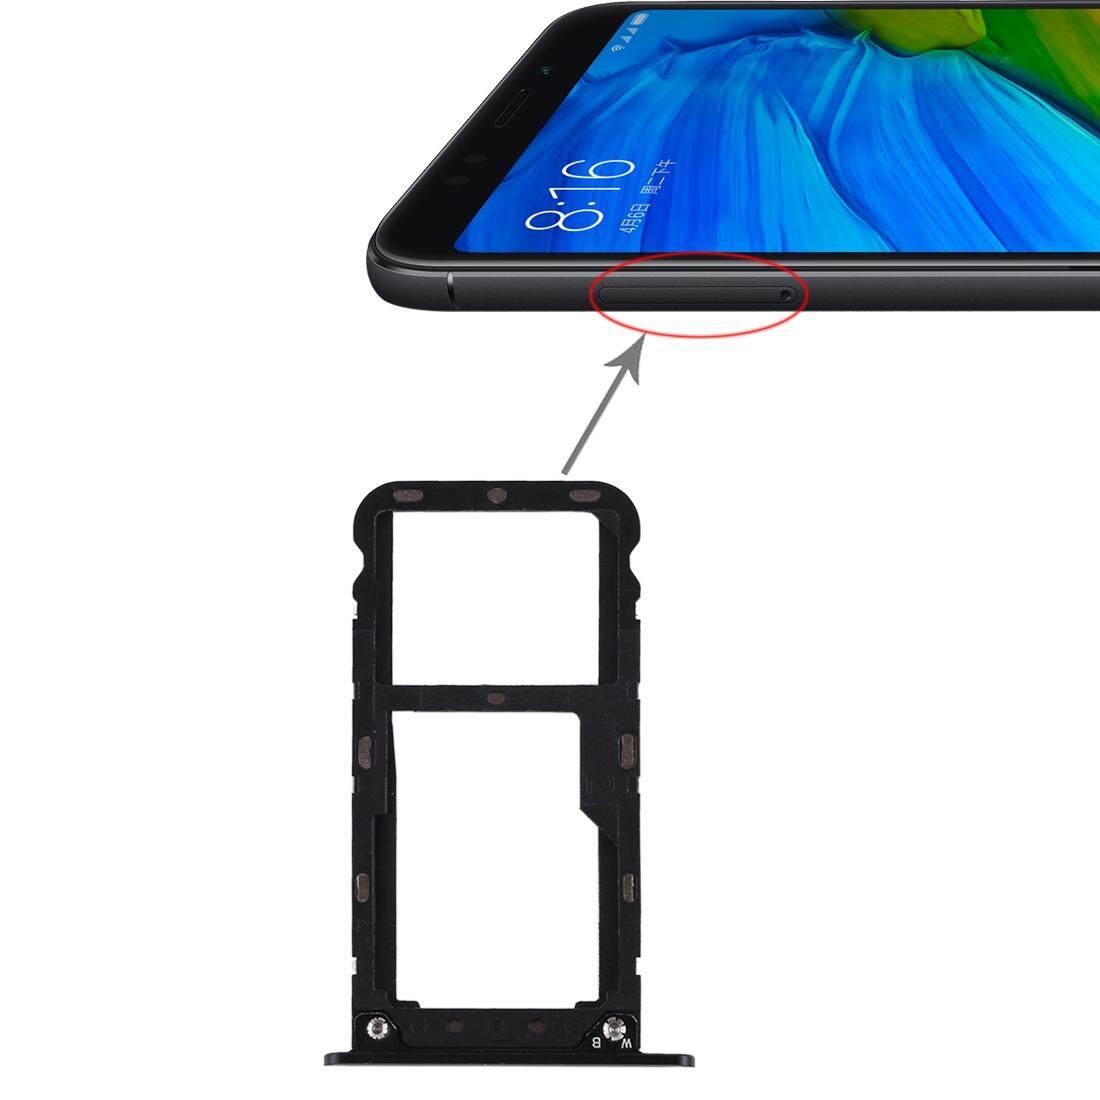 2 Kartu SIM/Micro Tray SD Card untuk Xiaomi Redmi 5 Plus (Hitam)